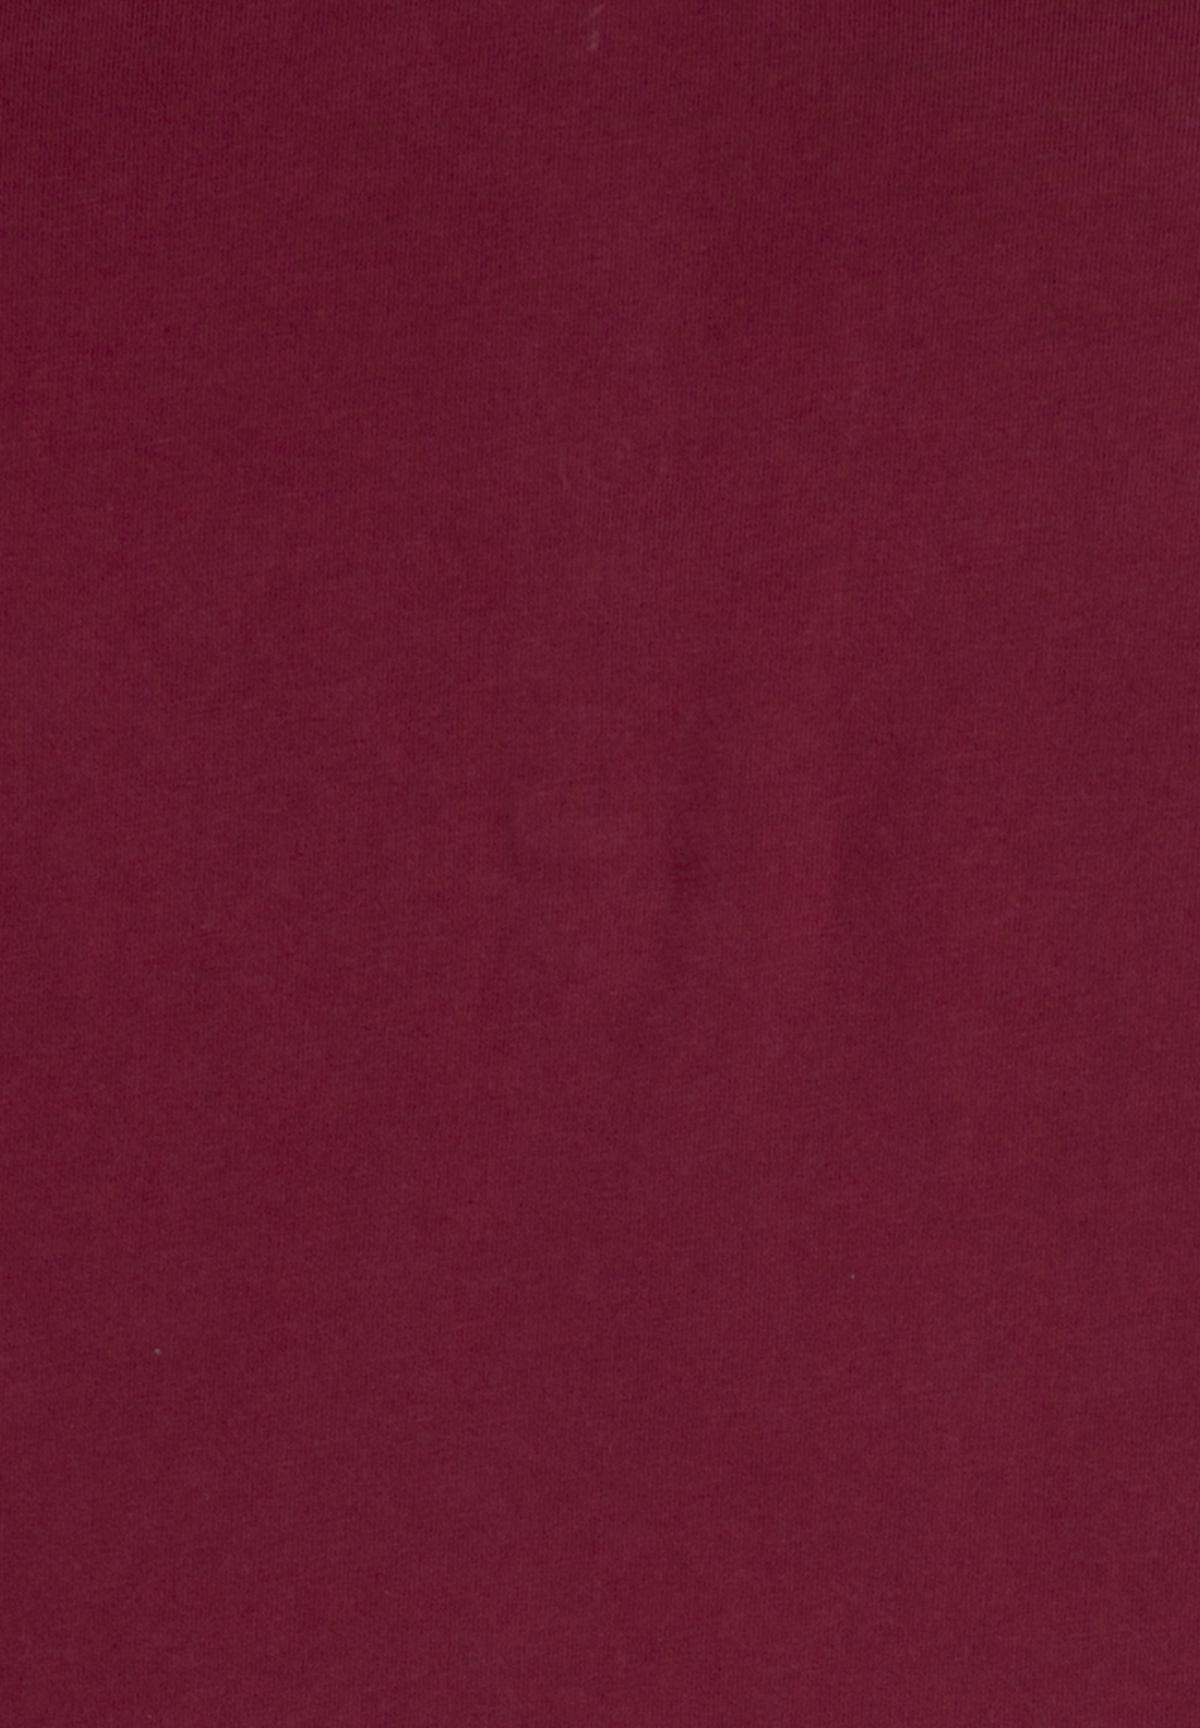 Camel-Active-Herren-Shirt-Poloshirt-Pique-Regular-Fit-NEU Indexbild 61